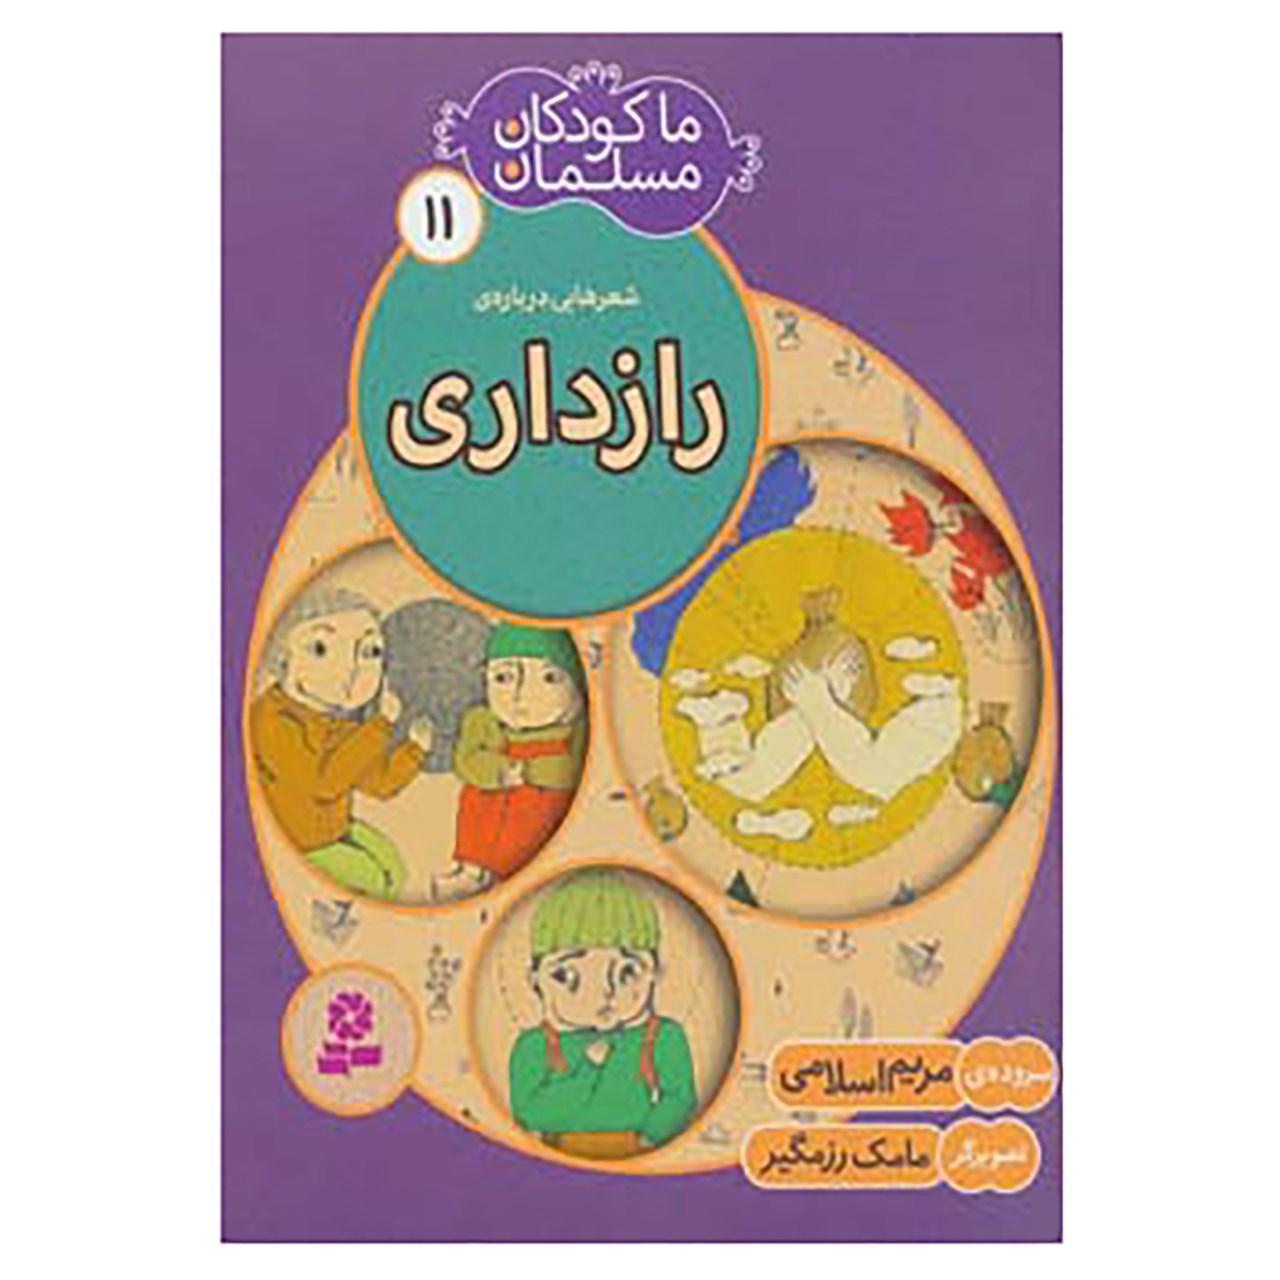 خرید                      کتاب ما کودکان مسلمان11 اثر مریم اسلامی